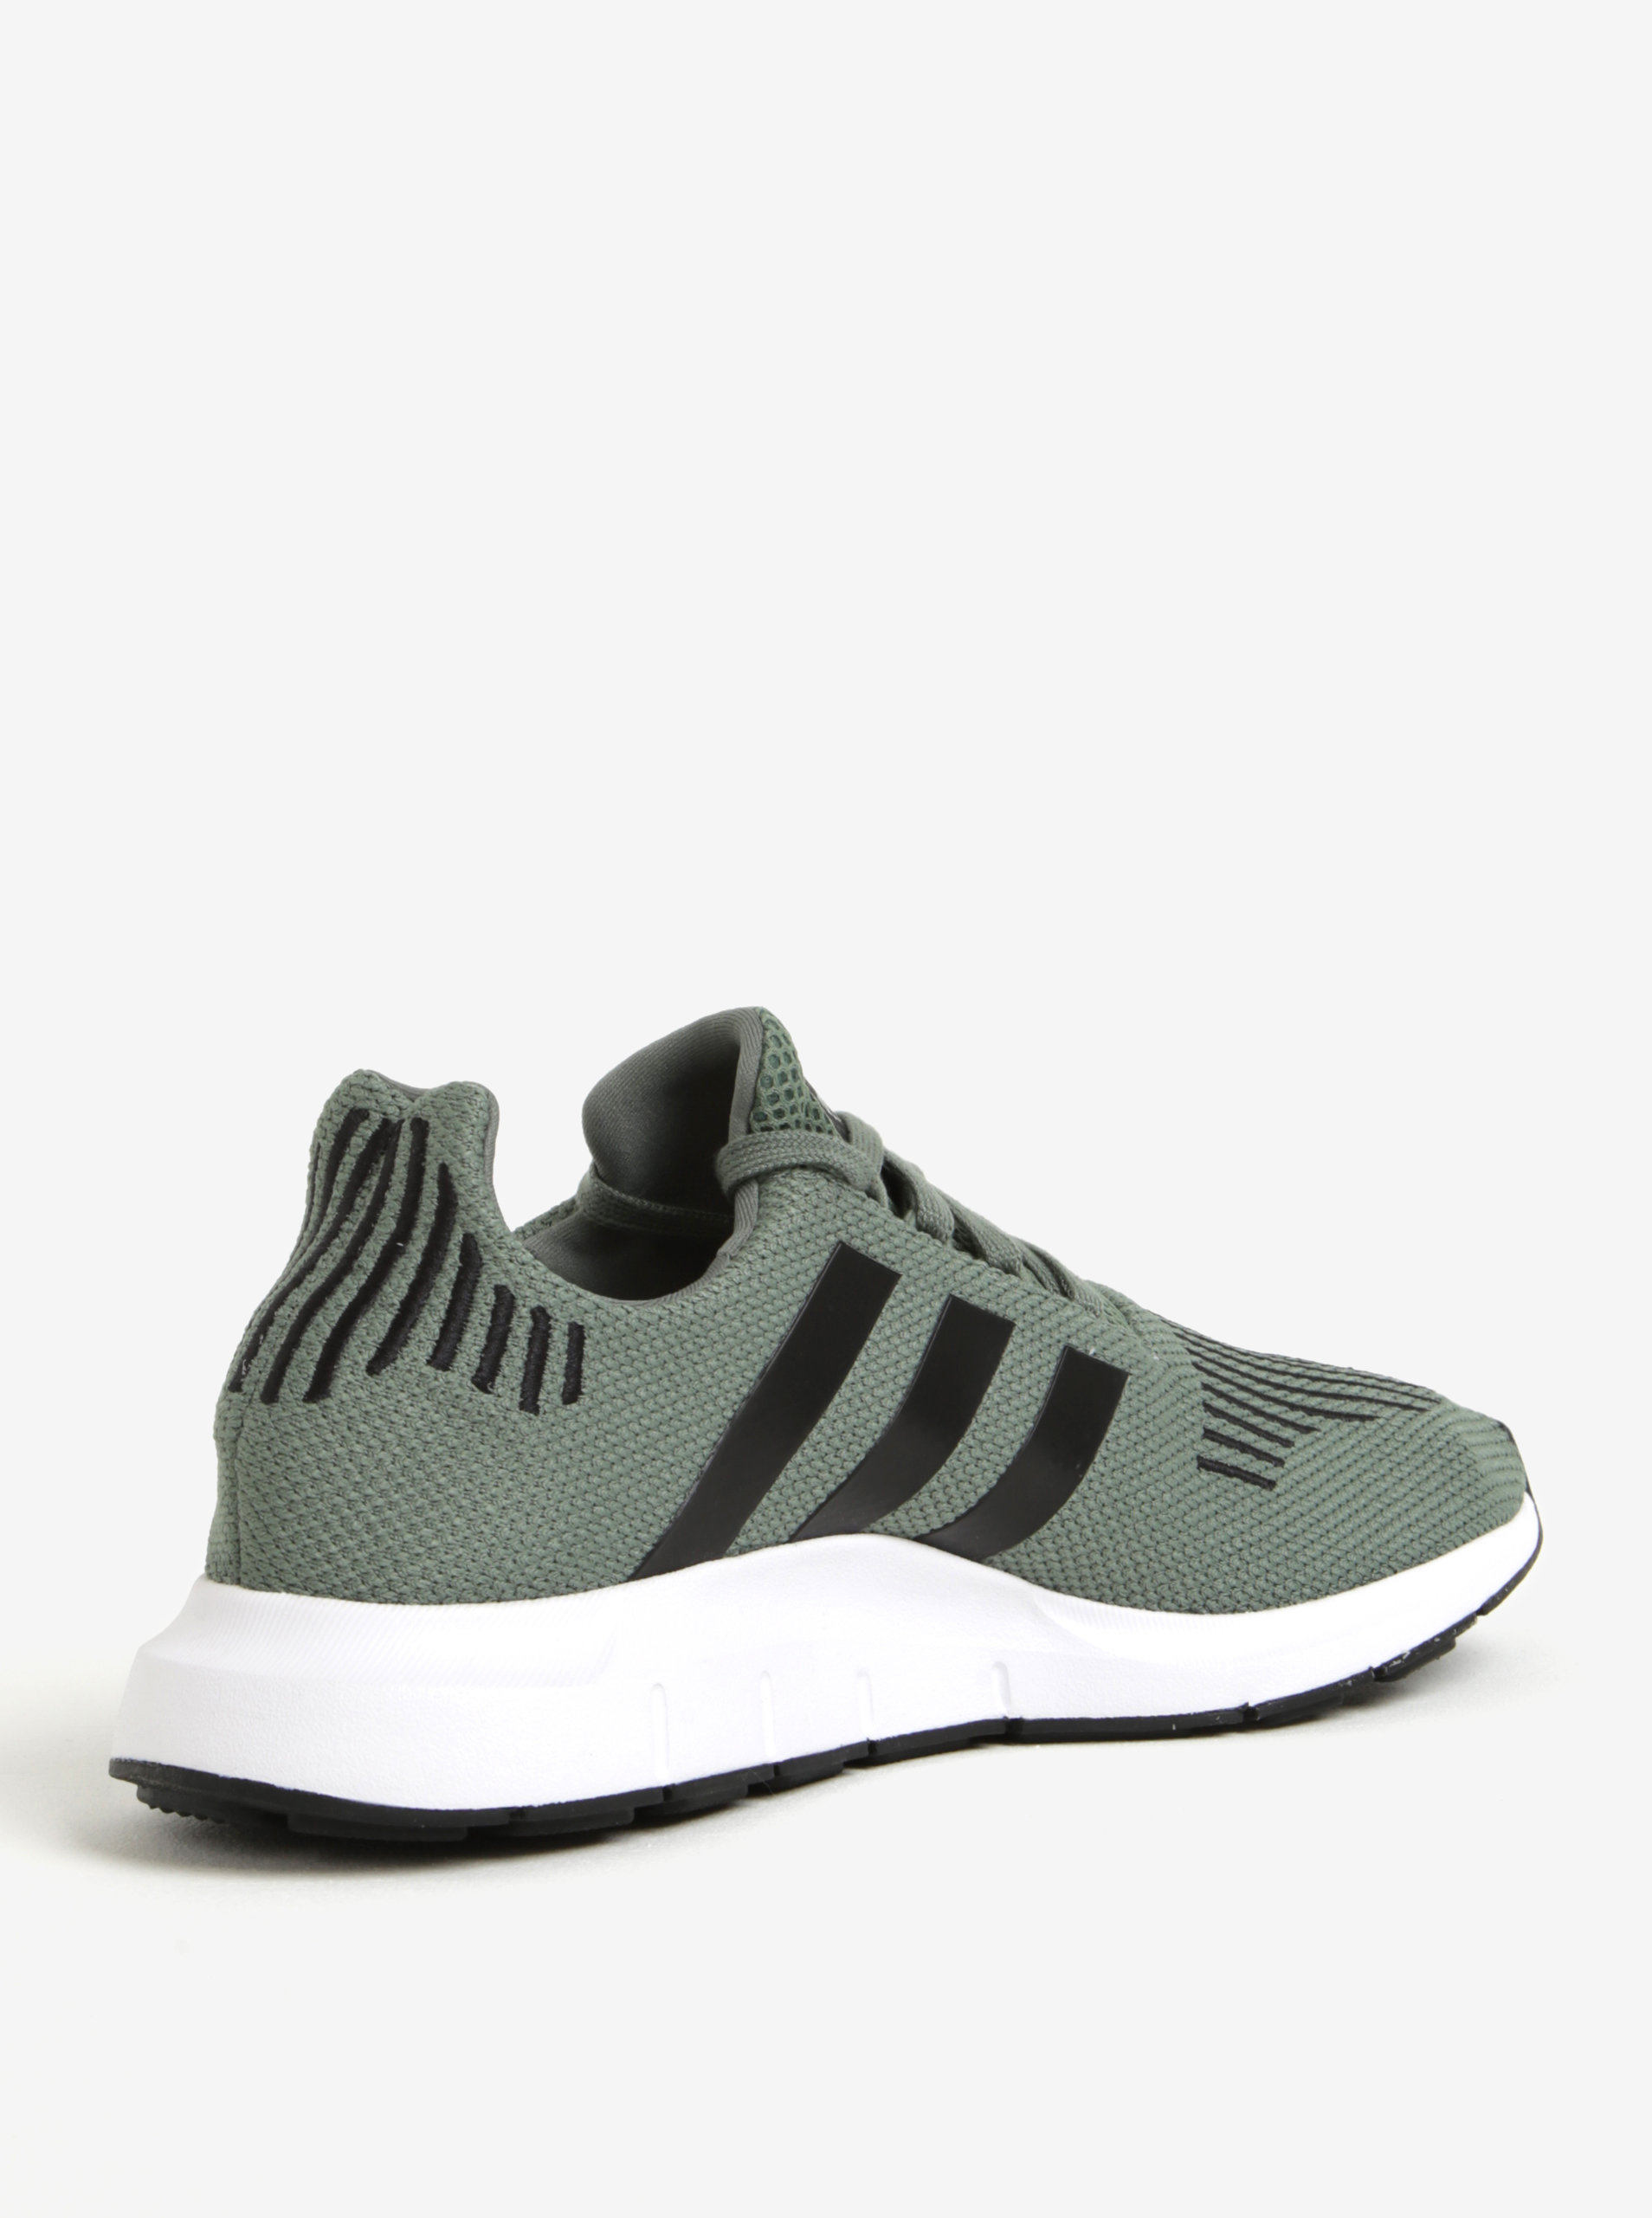 Khaki pánské tenisky adidas Originals Swift Run ... dbe3c4cf6d